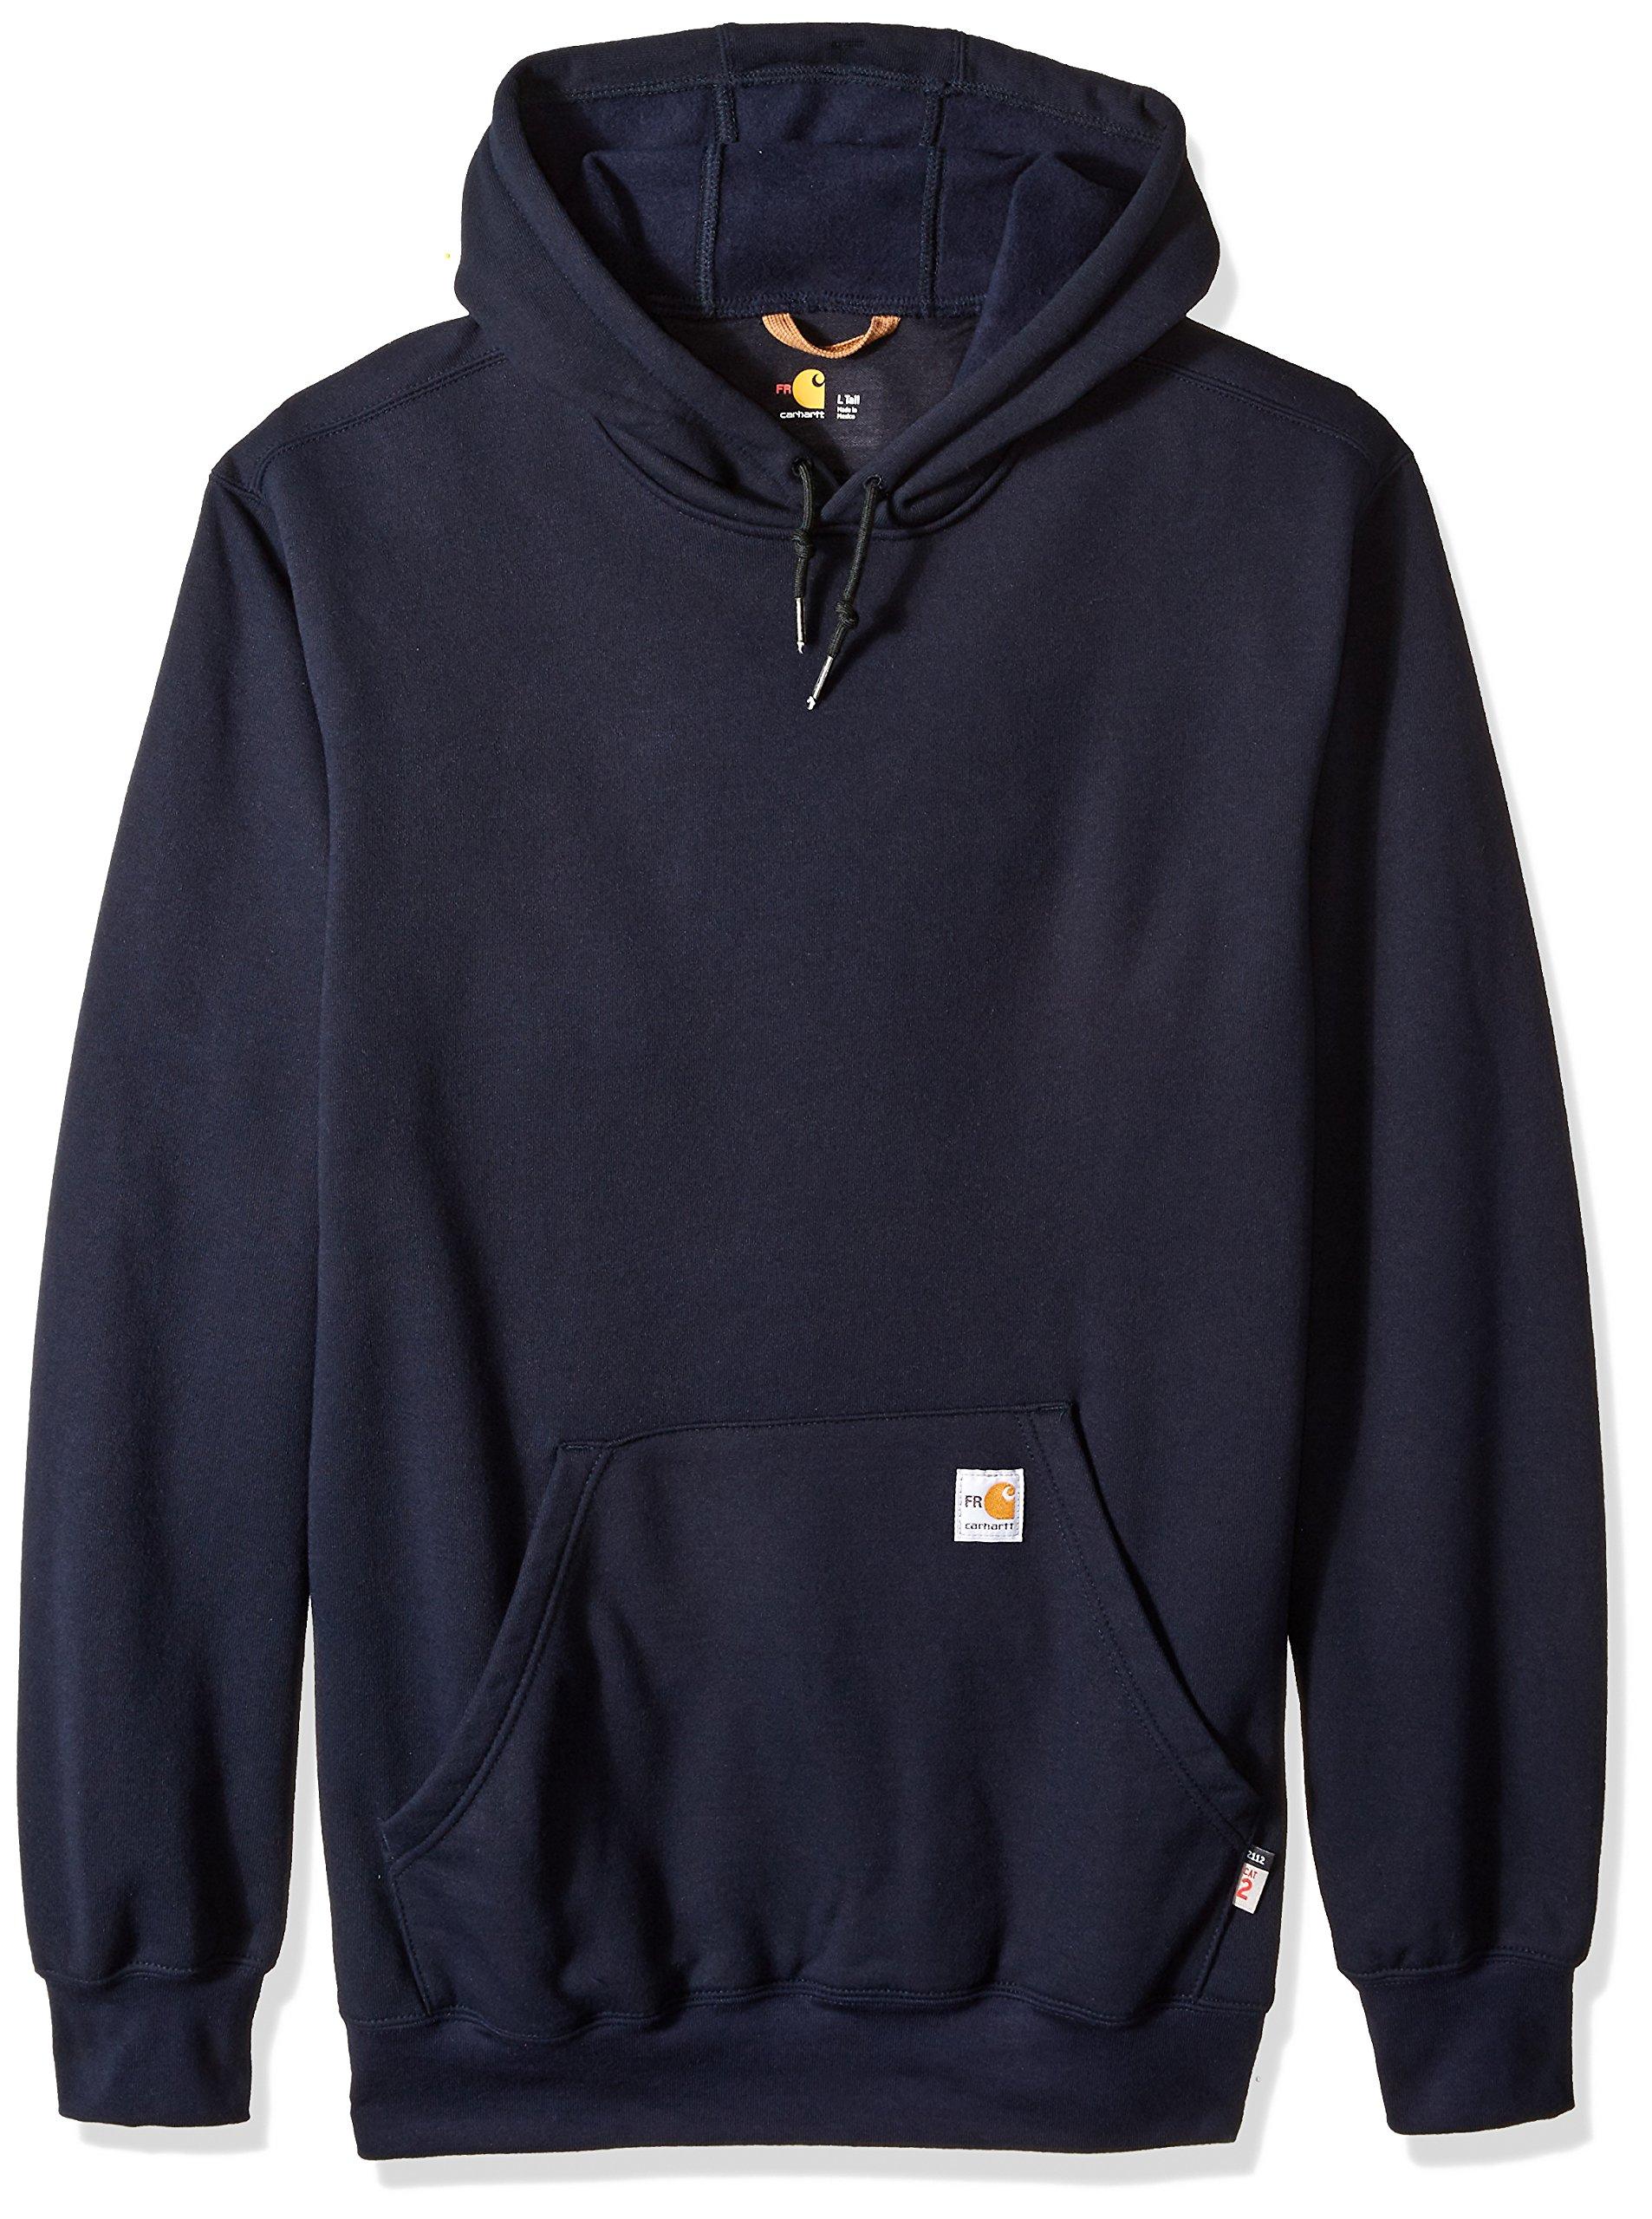 Carhartt Men's Big Big & Tall Flame Resistant Heavyweight Hooded Sweatshirt, Dark Navy, X-Large/Tall